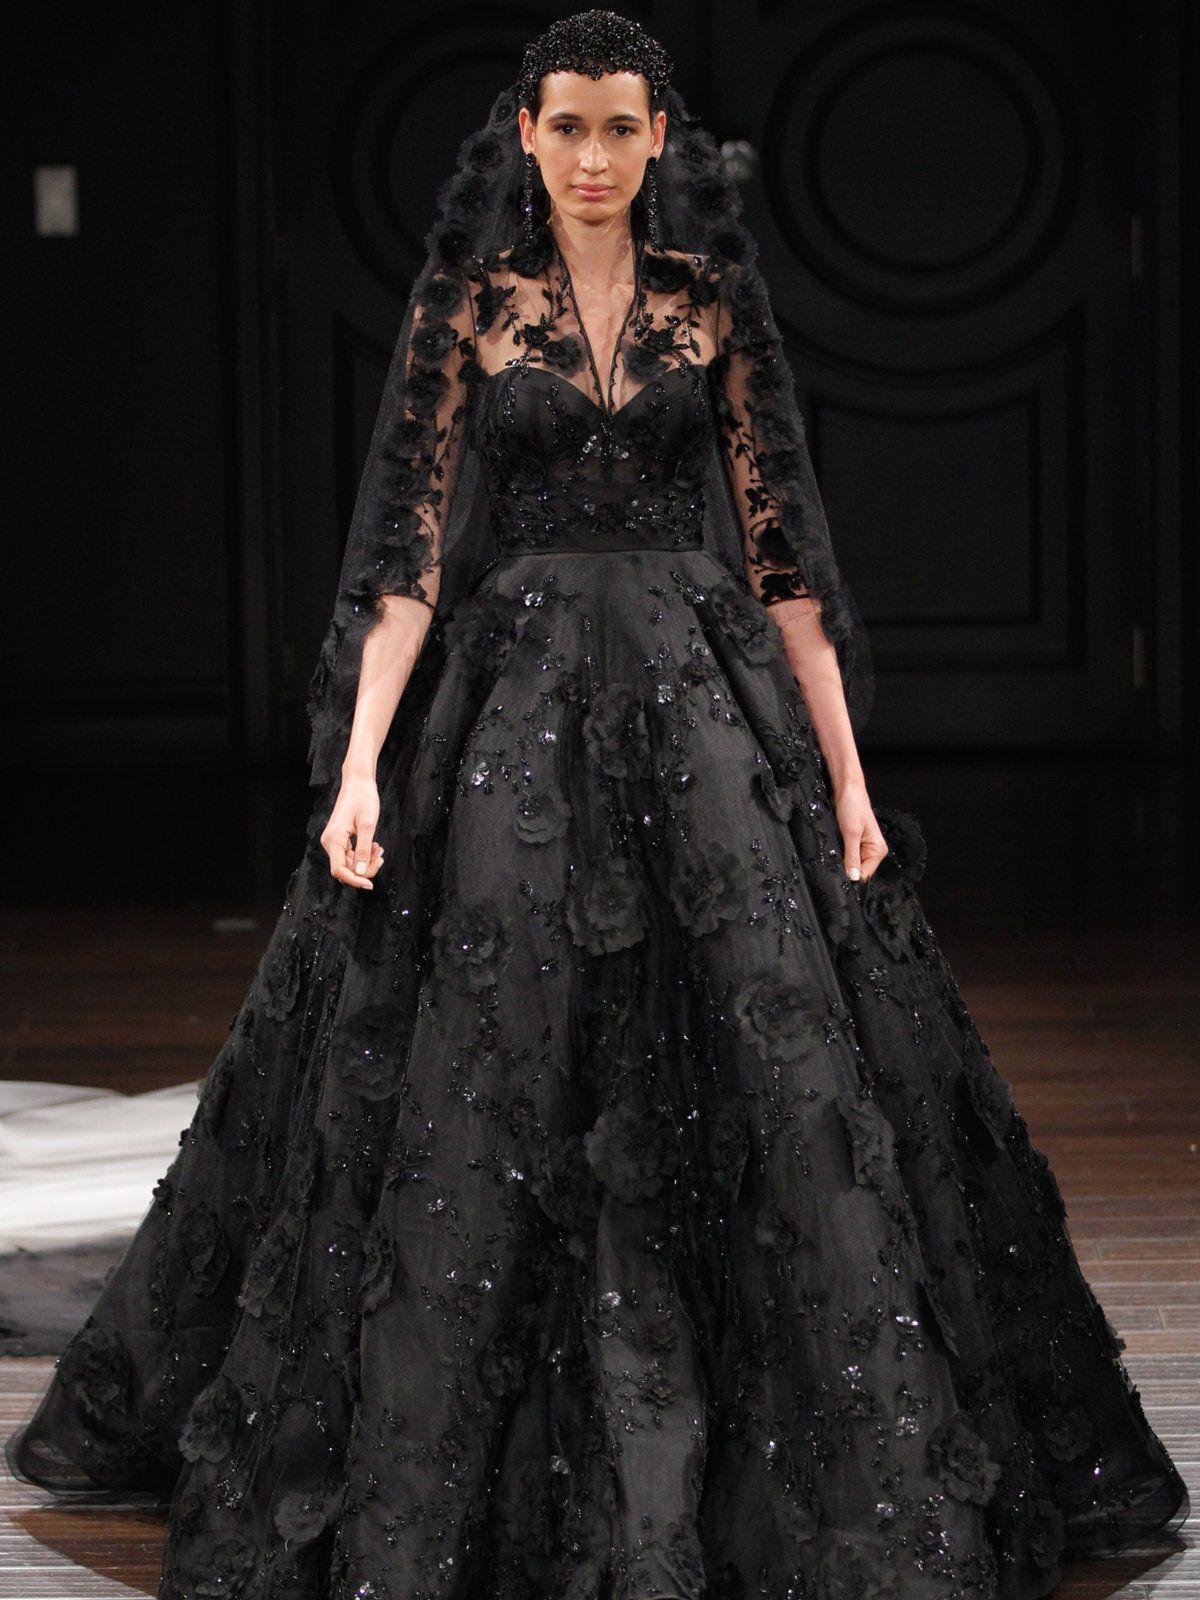 Schwarzes Hochzeitskleid | Hochzeitskleid, Hochzeitskleid ...